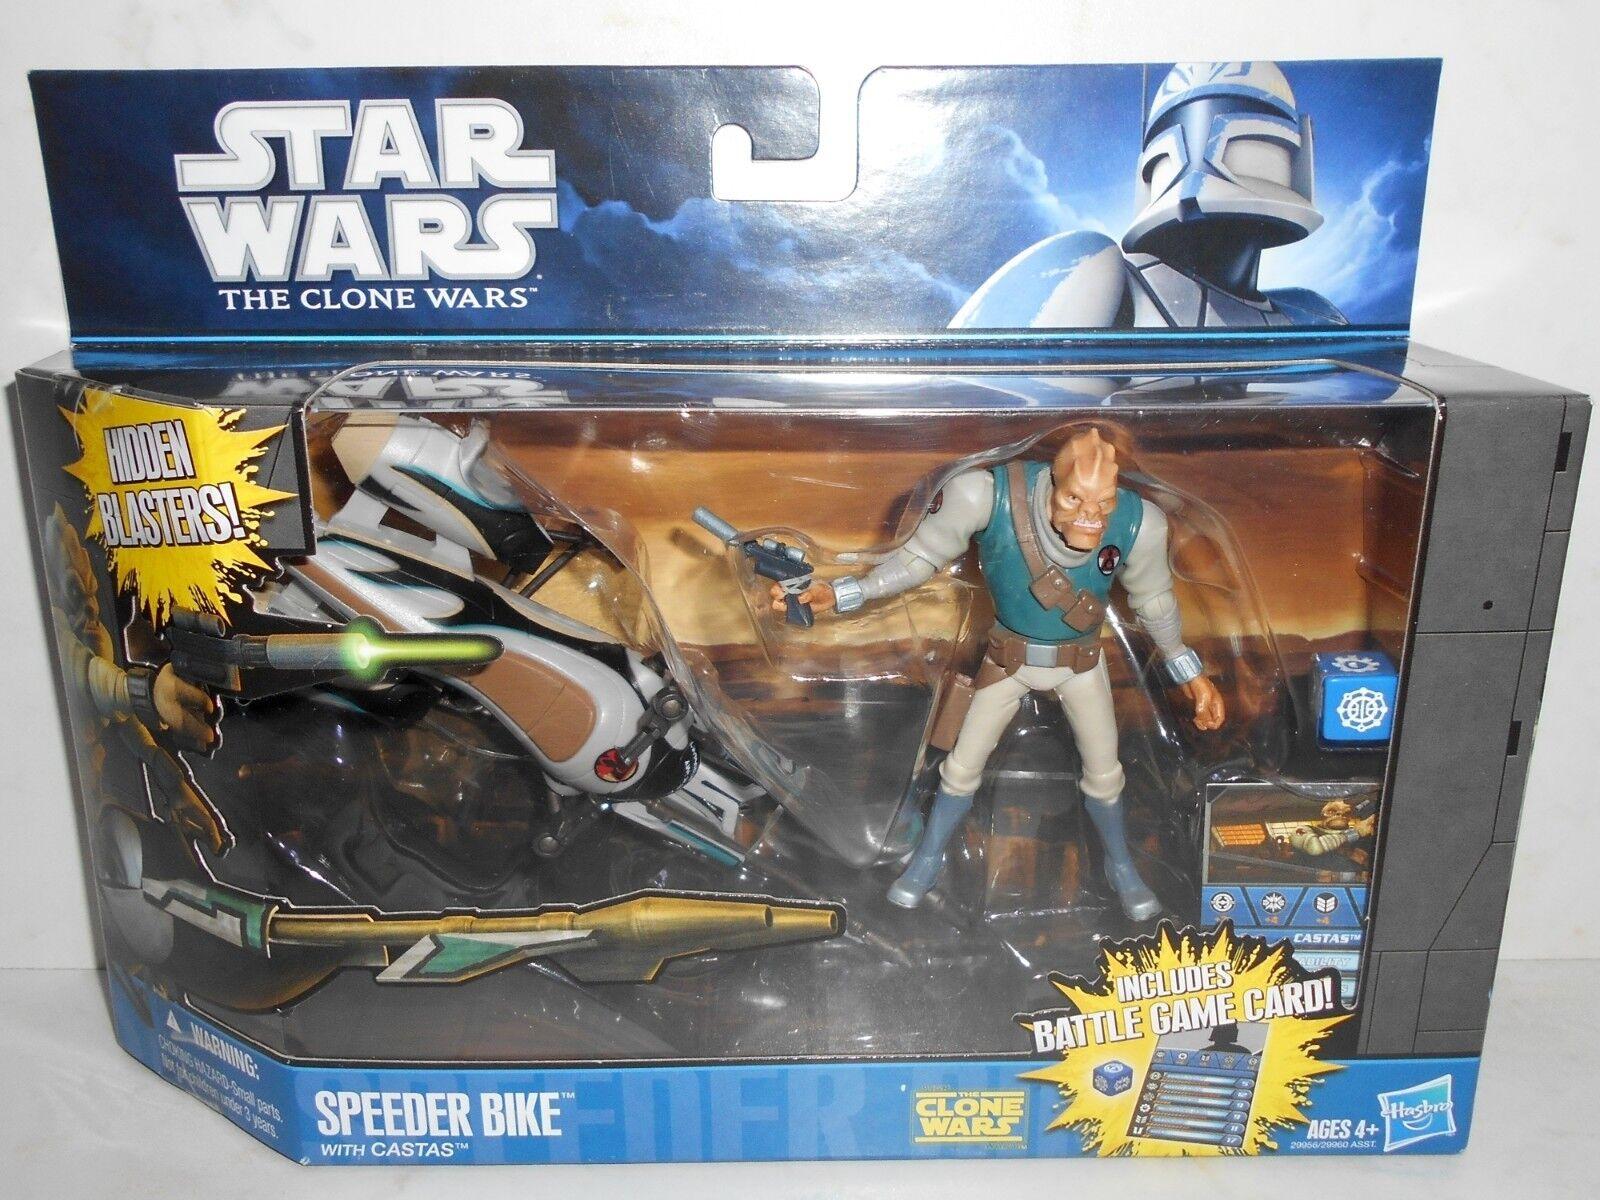 Brand New Hasbro 2010 Star Wars The Clone Wars 29956 SPEEDER BIKE With CASTAS 4+